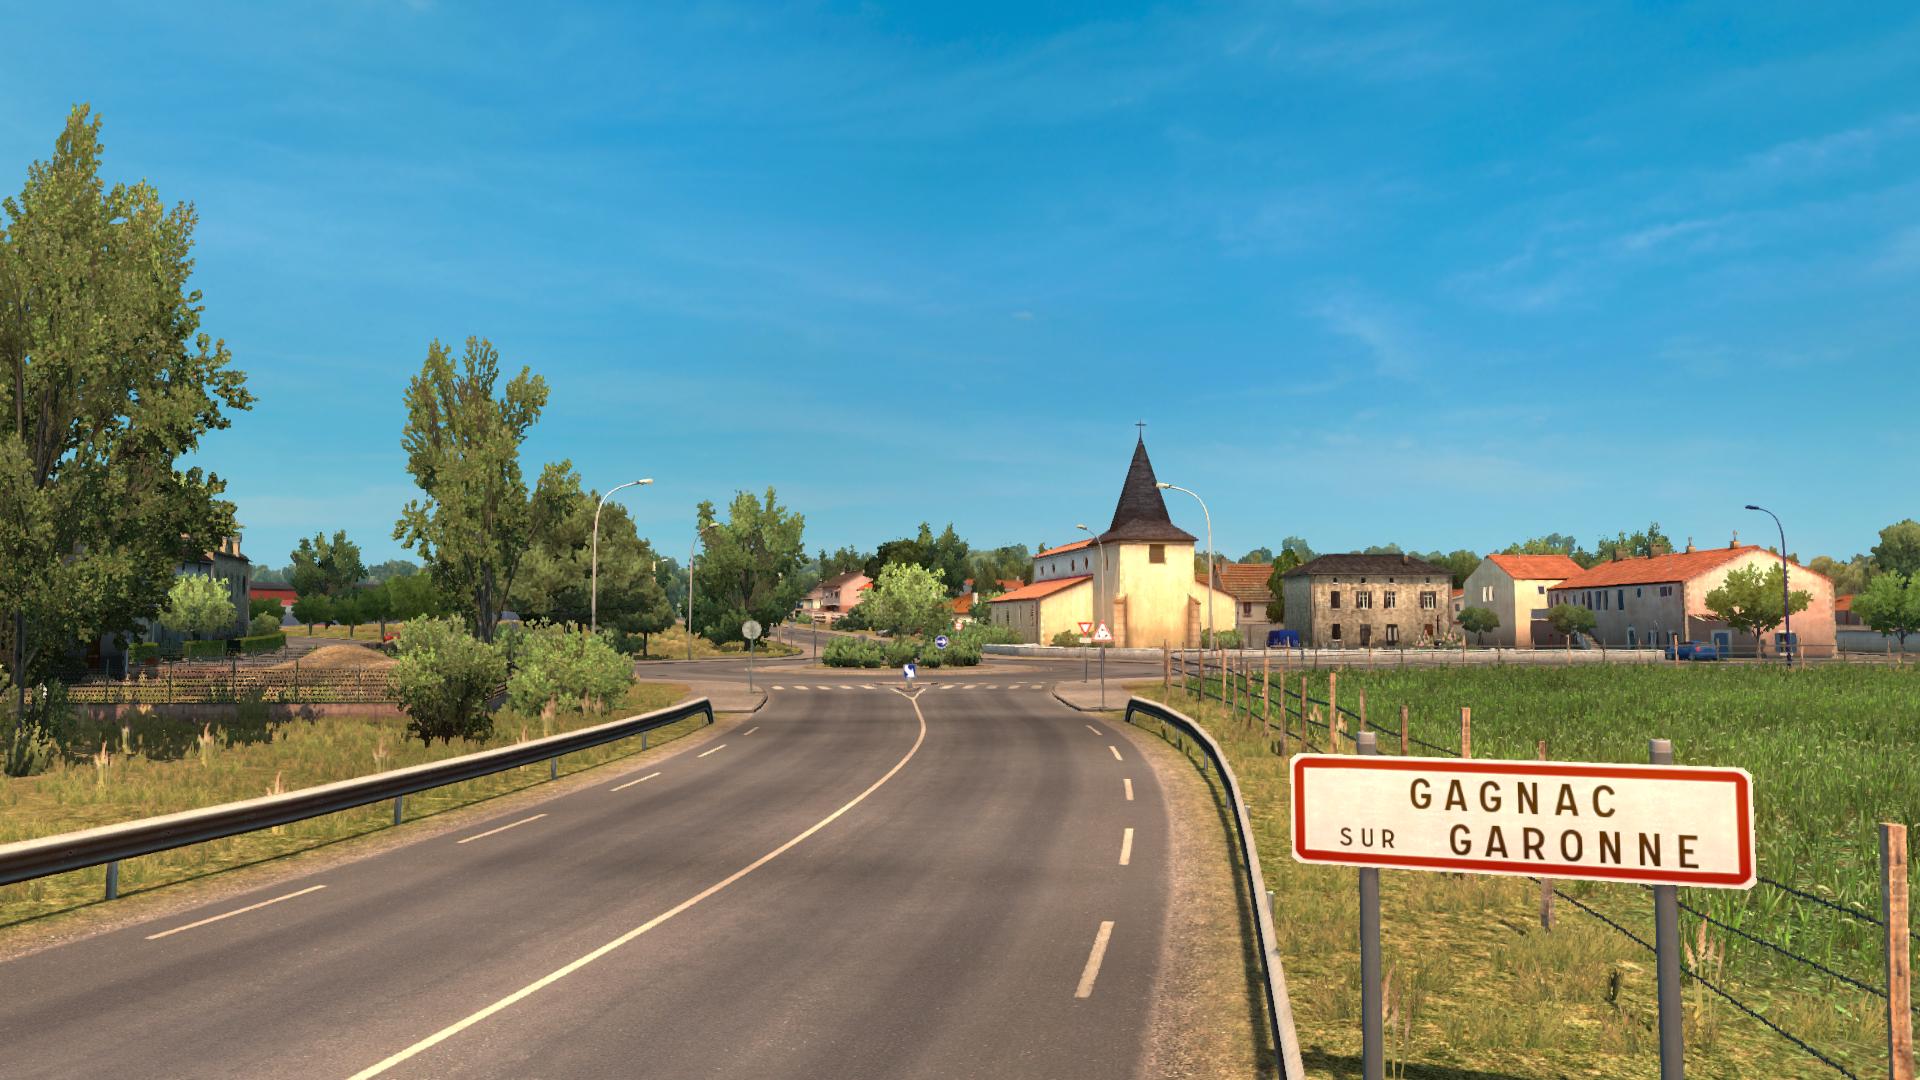 Gagnac-sur-Garonne